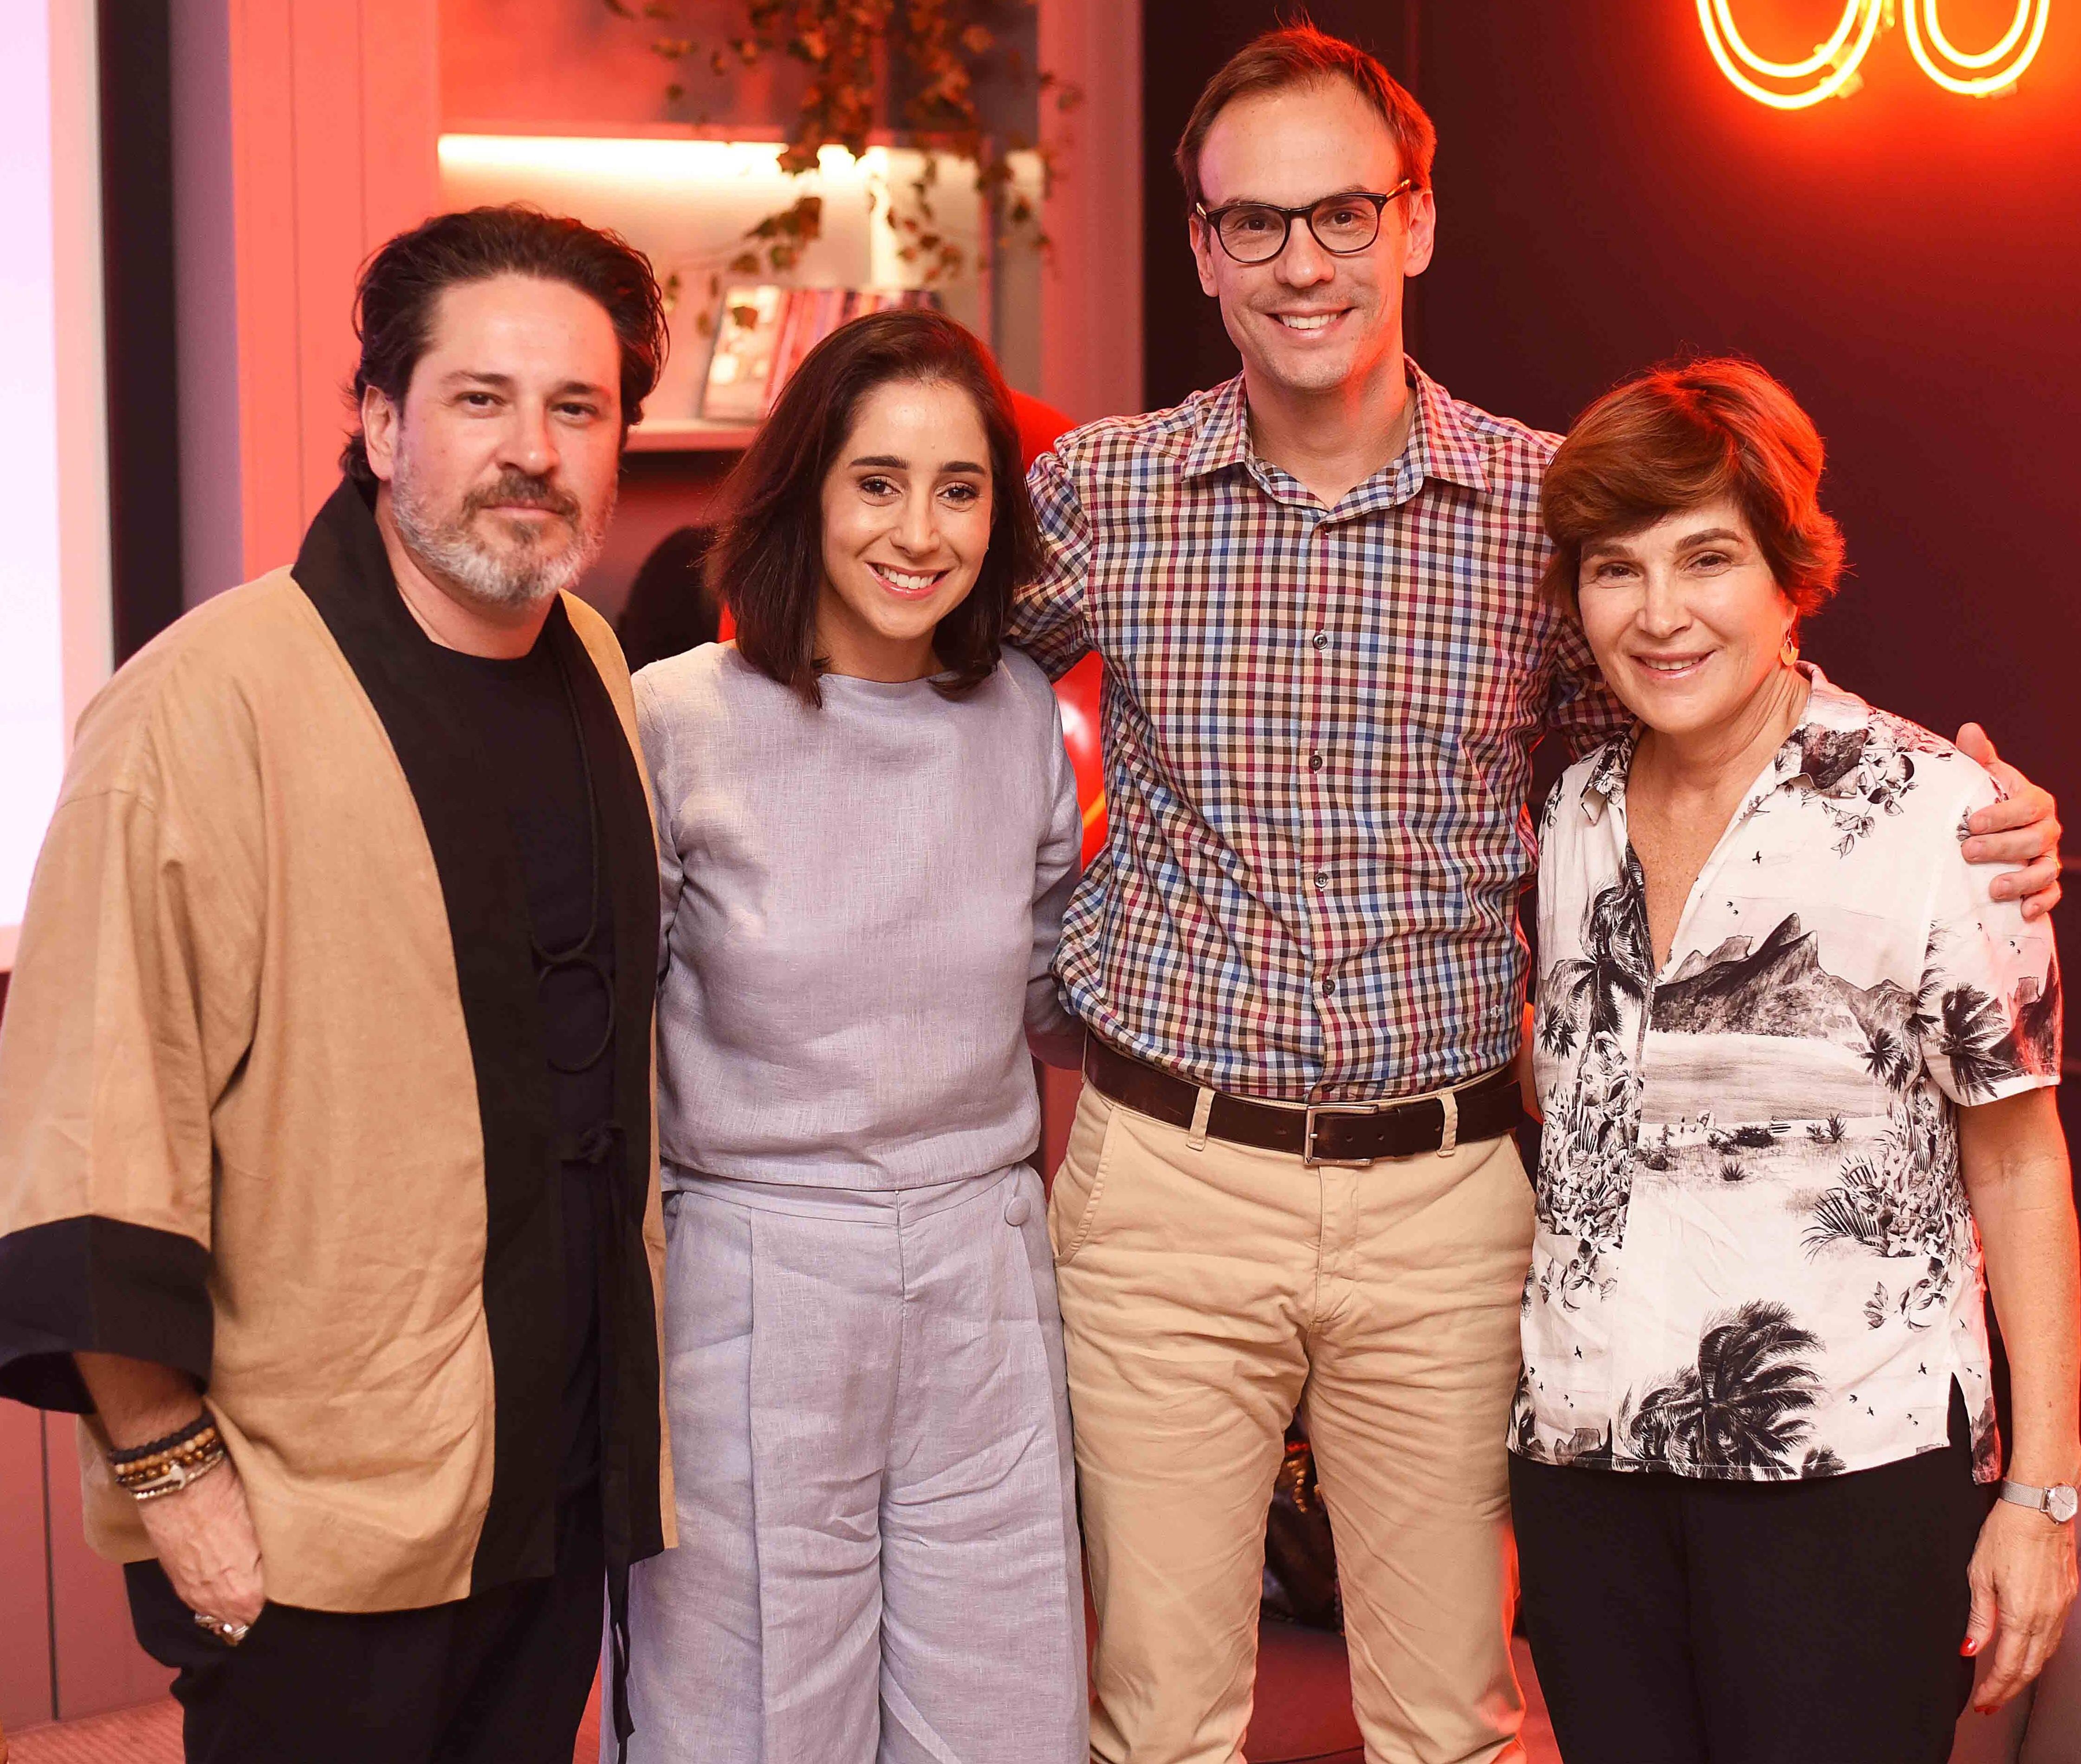 Celso Rayol, Antonia Leite Barbosa, Fernando Costa e Nina Almeida Braga /Foto: Ari Kaye